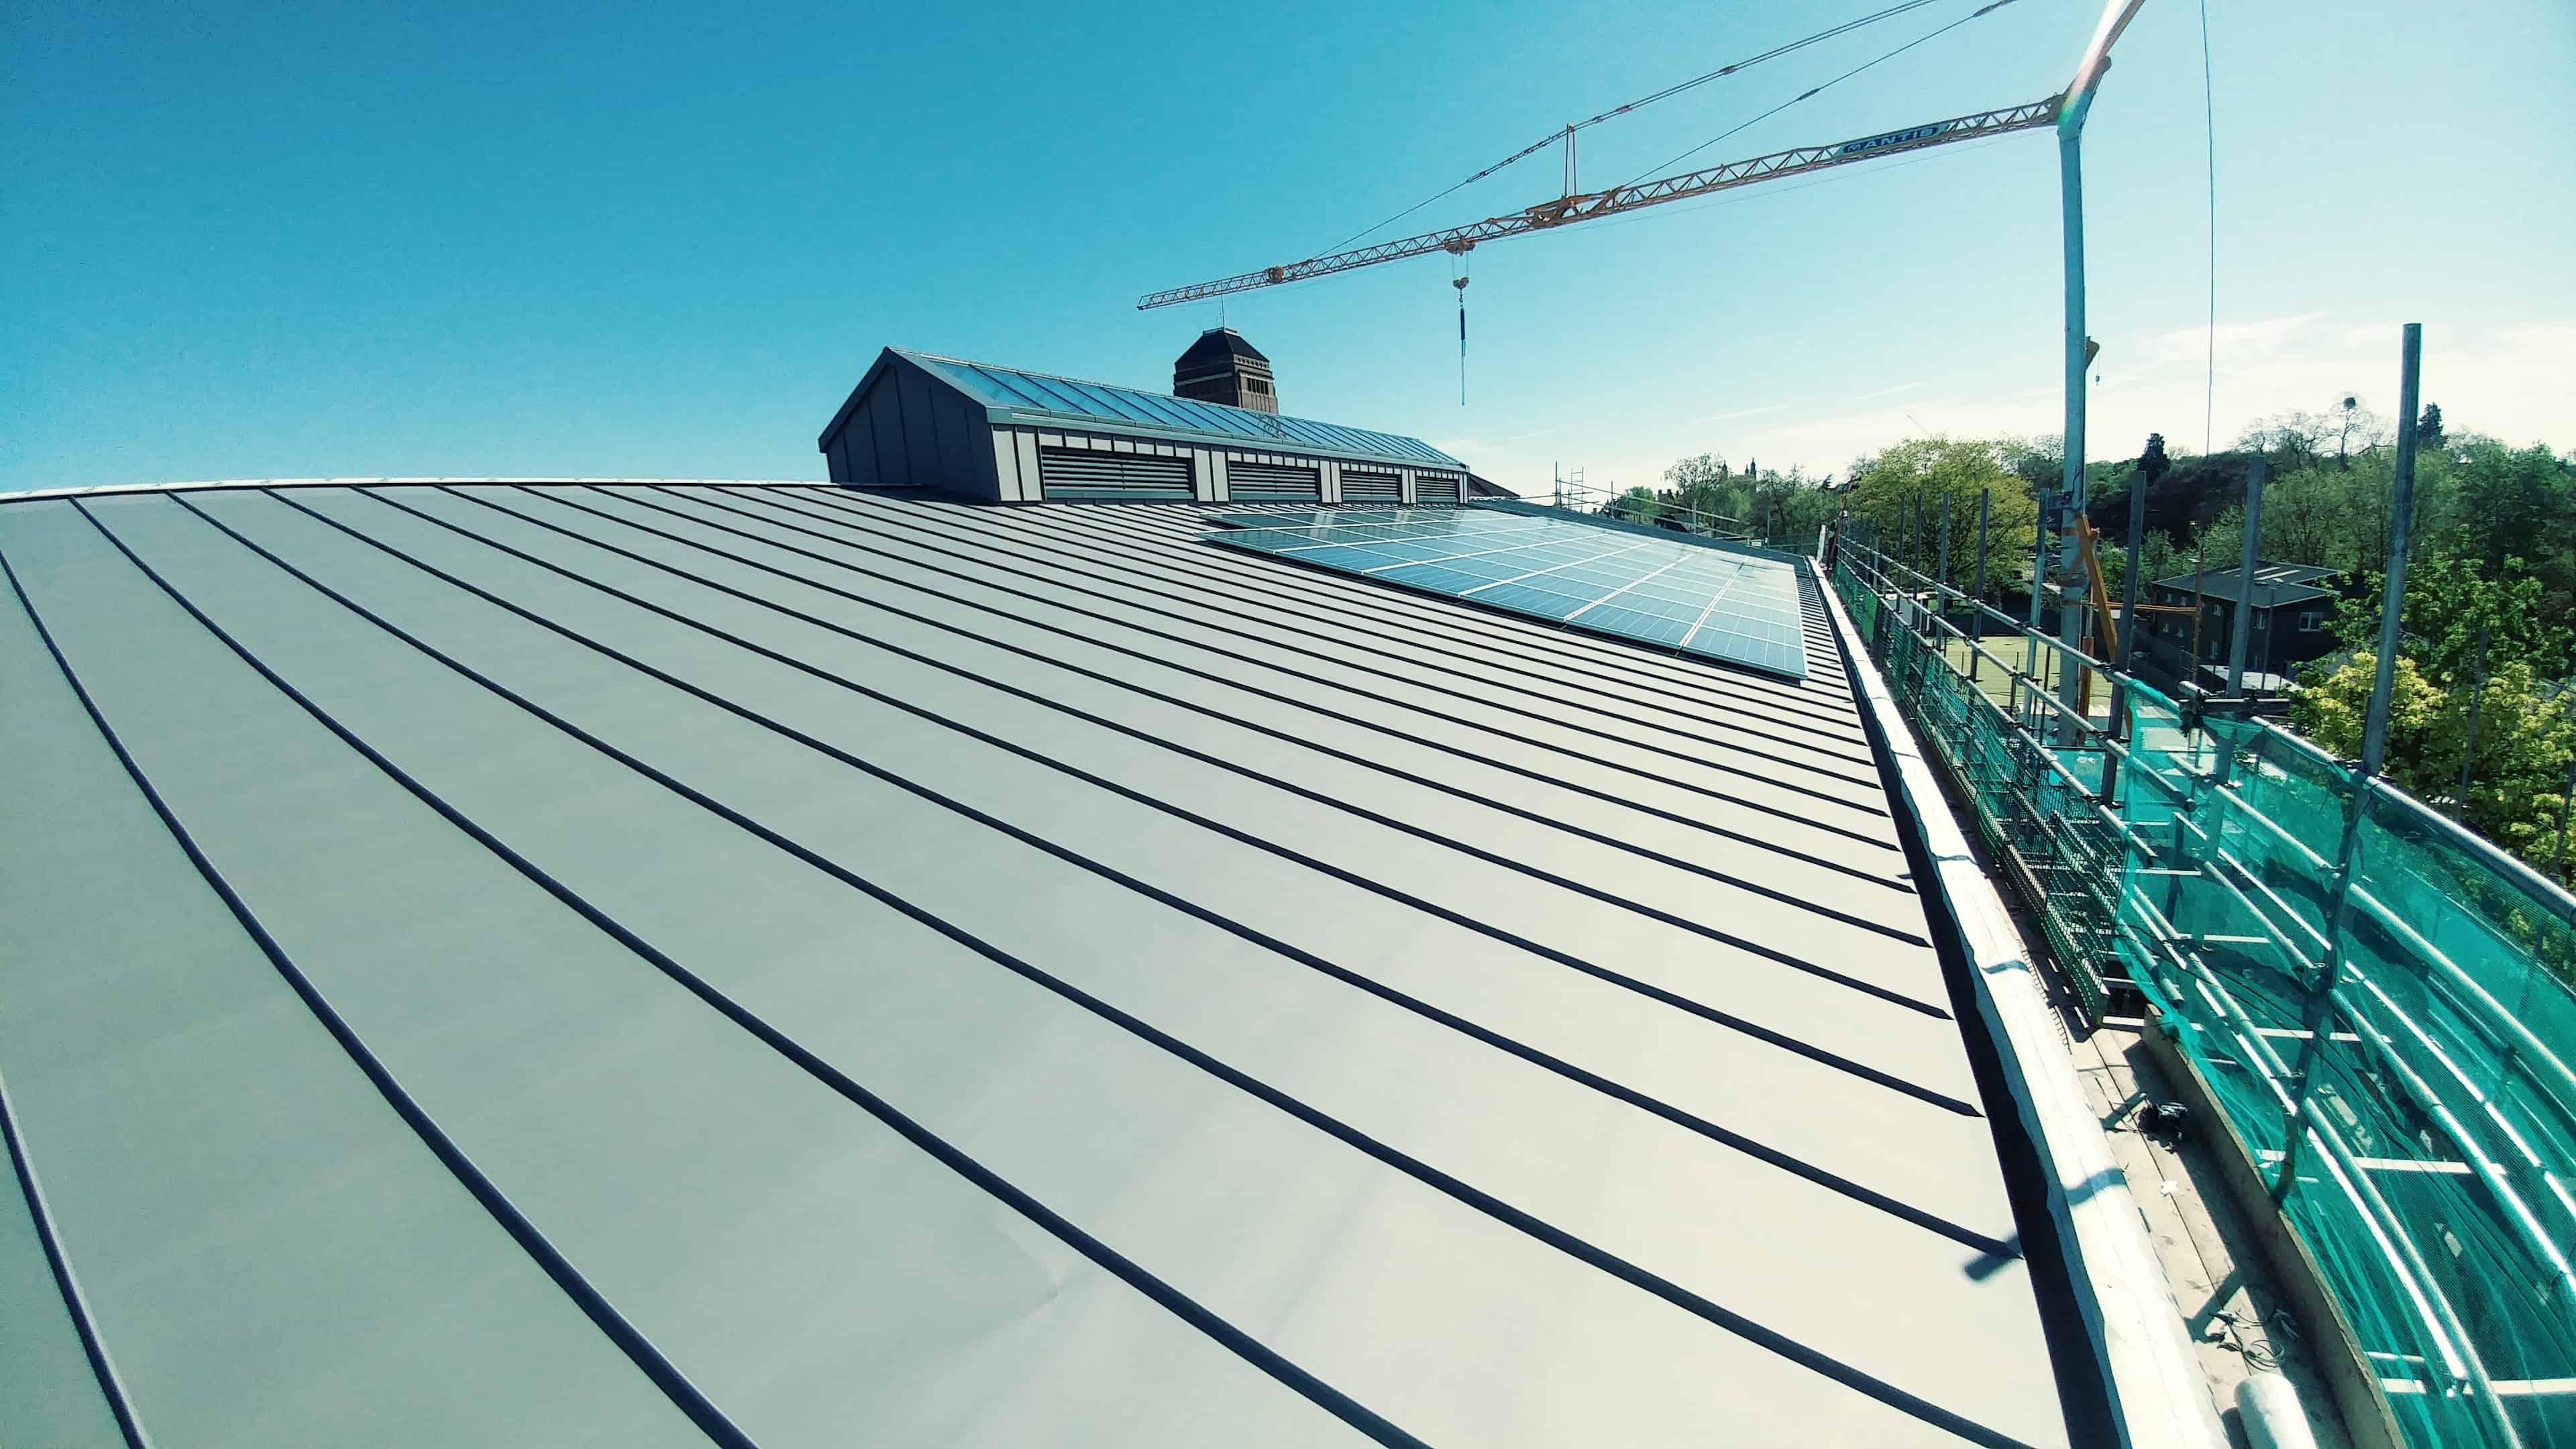 Zinc Roofing Project Progress Kings College Cambridge